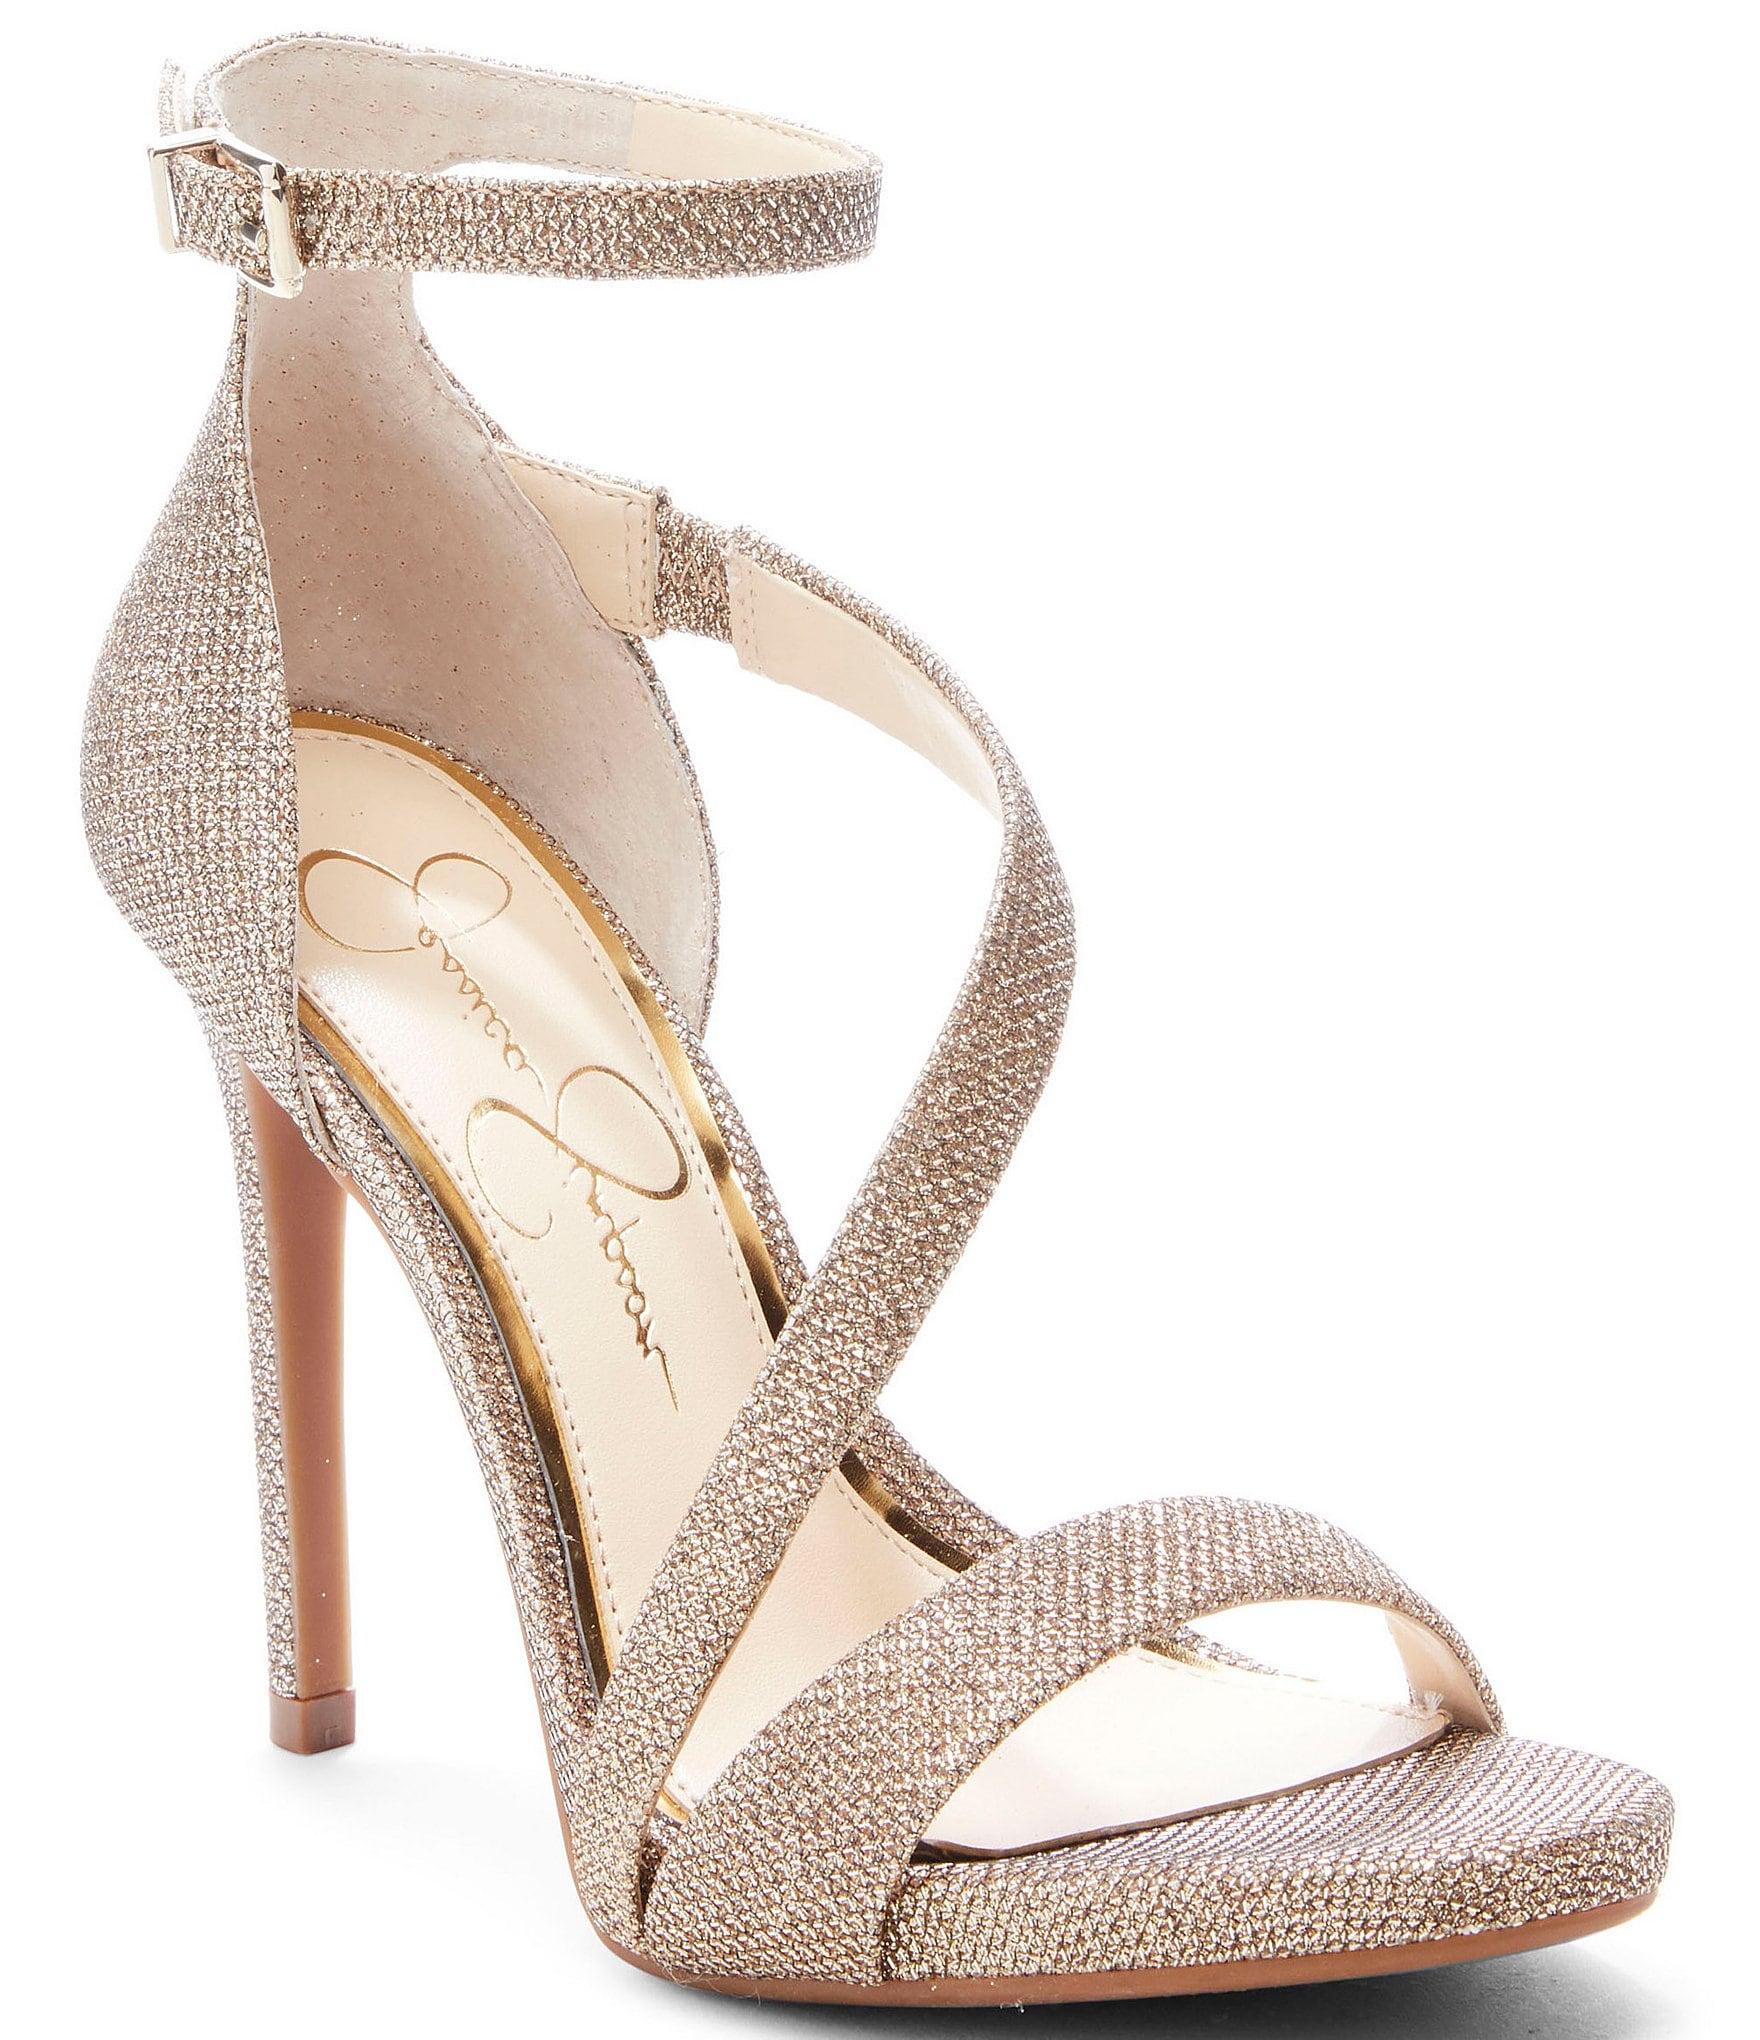 4f183c38f Jessica Simpson Women's Bridal & Wedding Shoes | Dillard's